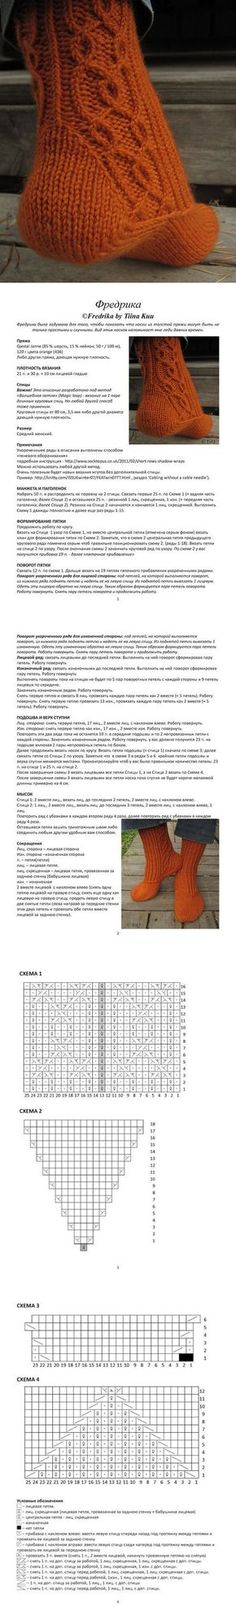 ideas for knitting socks pattern tricot Chevron Crochet Blanket Pattern, Baby Booties Knitting Pattern, Crochet Gloves Pattern, Granny Square Crochet Pattern, Crochet Slippers, Diy Knitting Needle Case, Knitting Stitches, Knitting Designs, Knitting Patterns Free